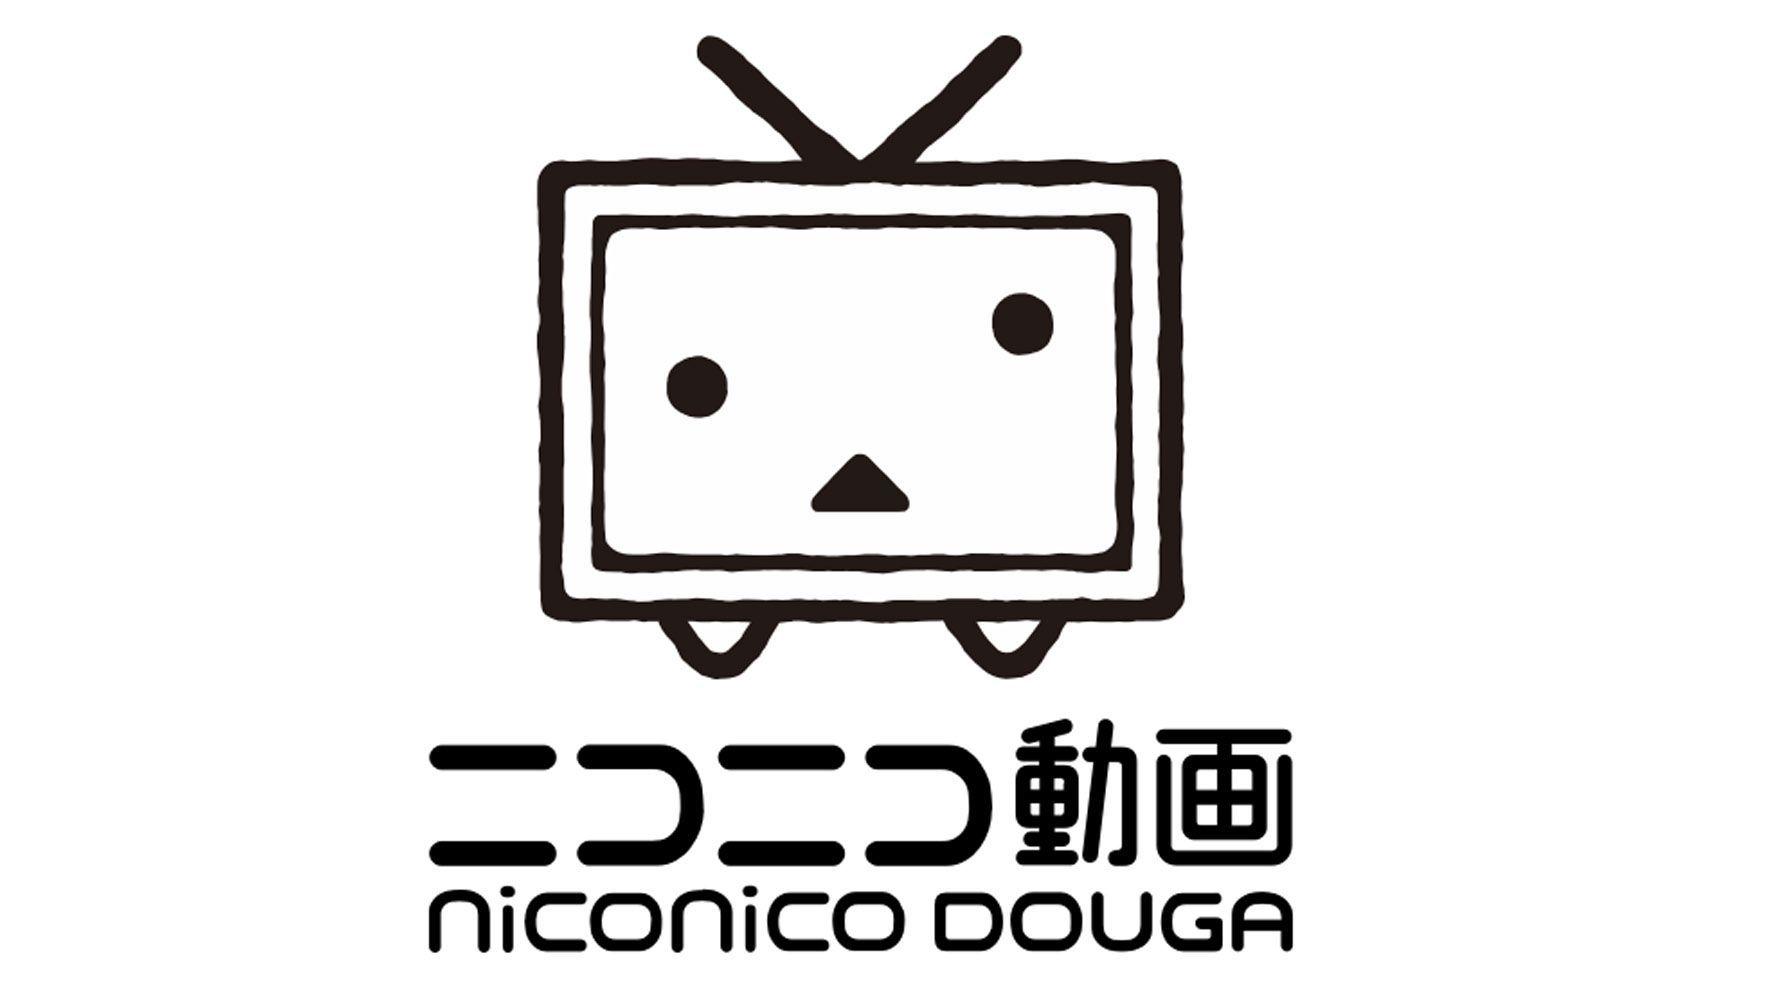 niconico 用户年龄